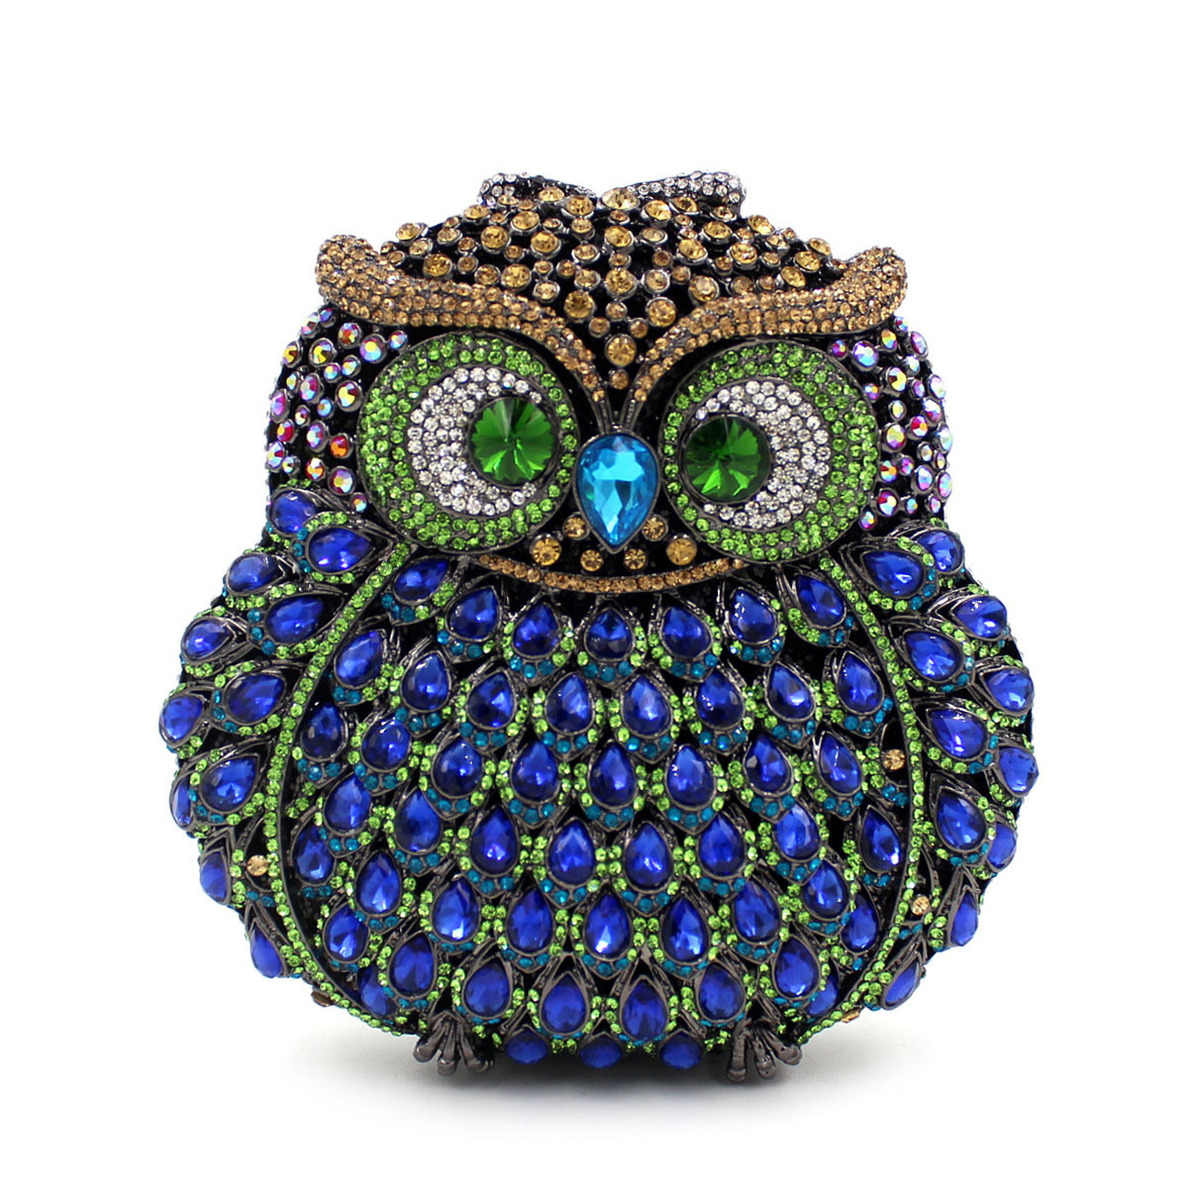 GIFT BOX Owl Diamond Evening Women Bag Party Crystals Clutches Miaudieres Wedding Purses Ladies Hollow Out Handbags Bolsas